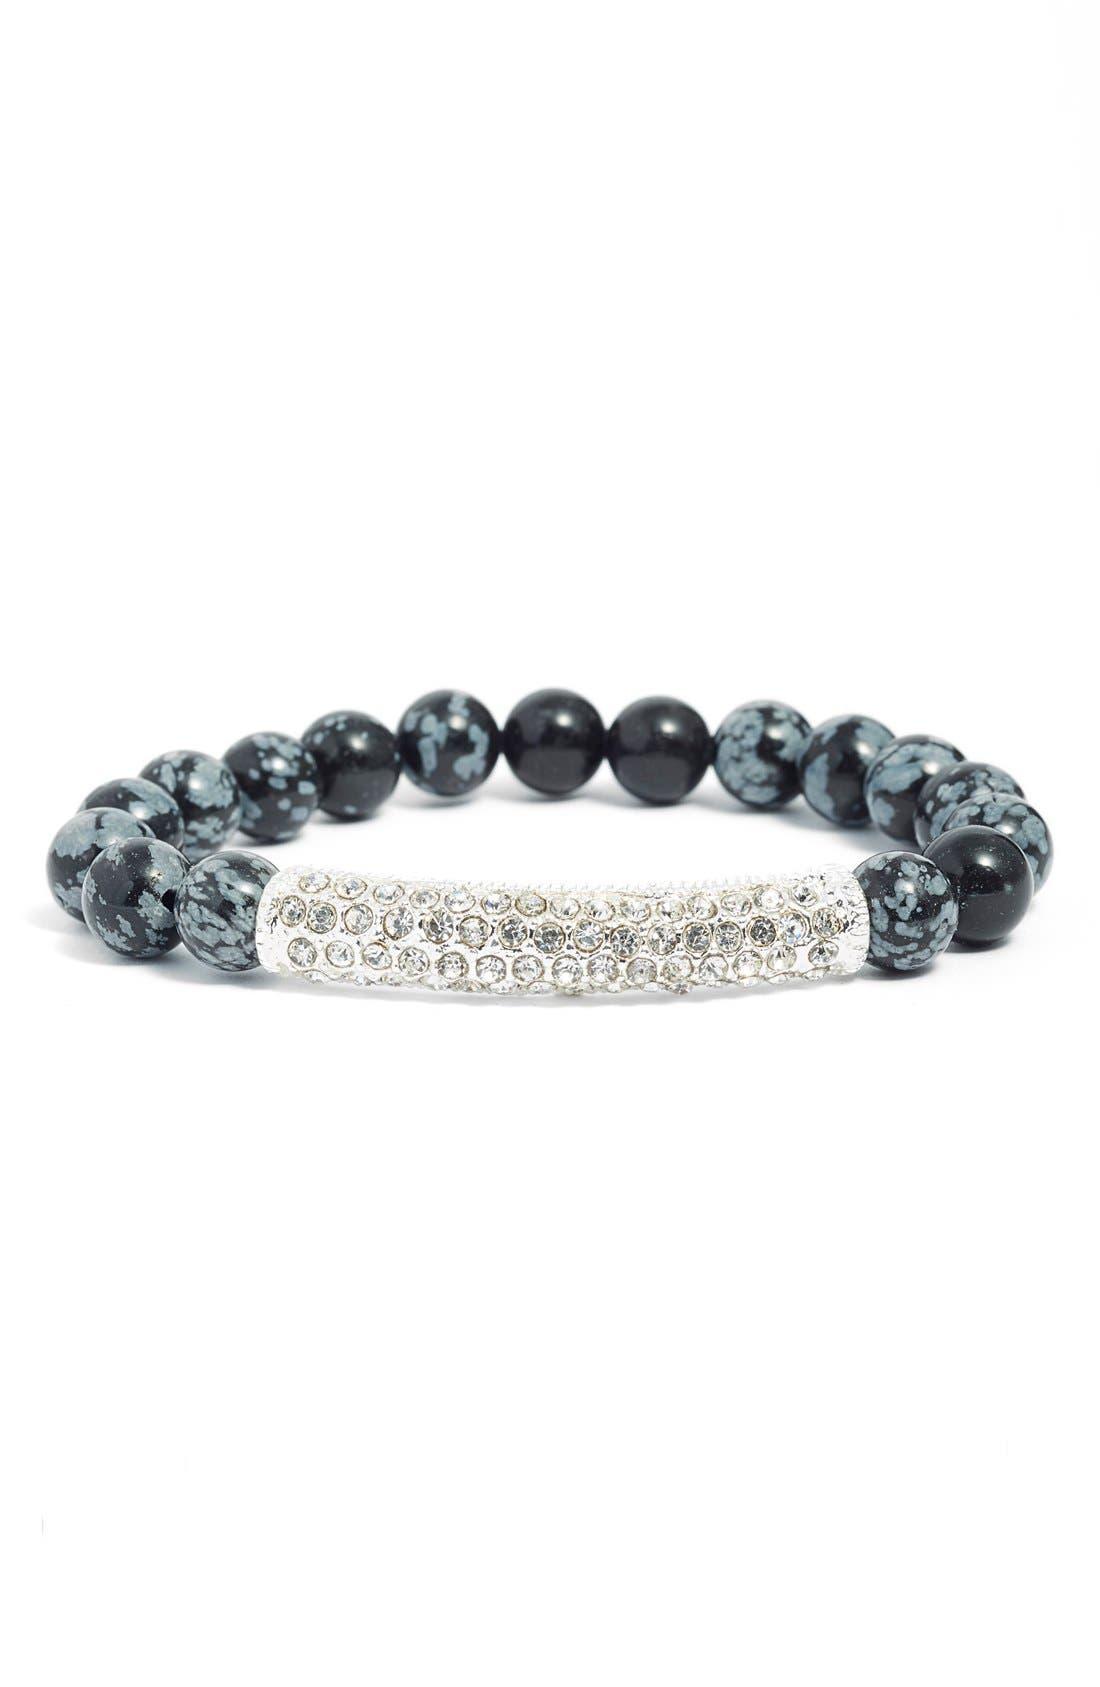 Alternate Image 1 Selected - Elise M. 'Calypso' Pavé Crystal Beaded Bracelet